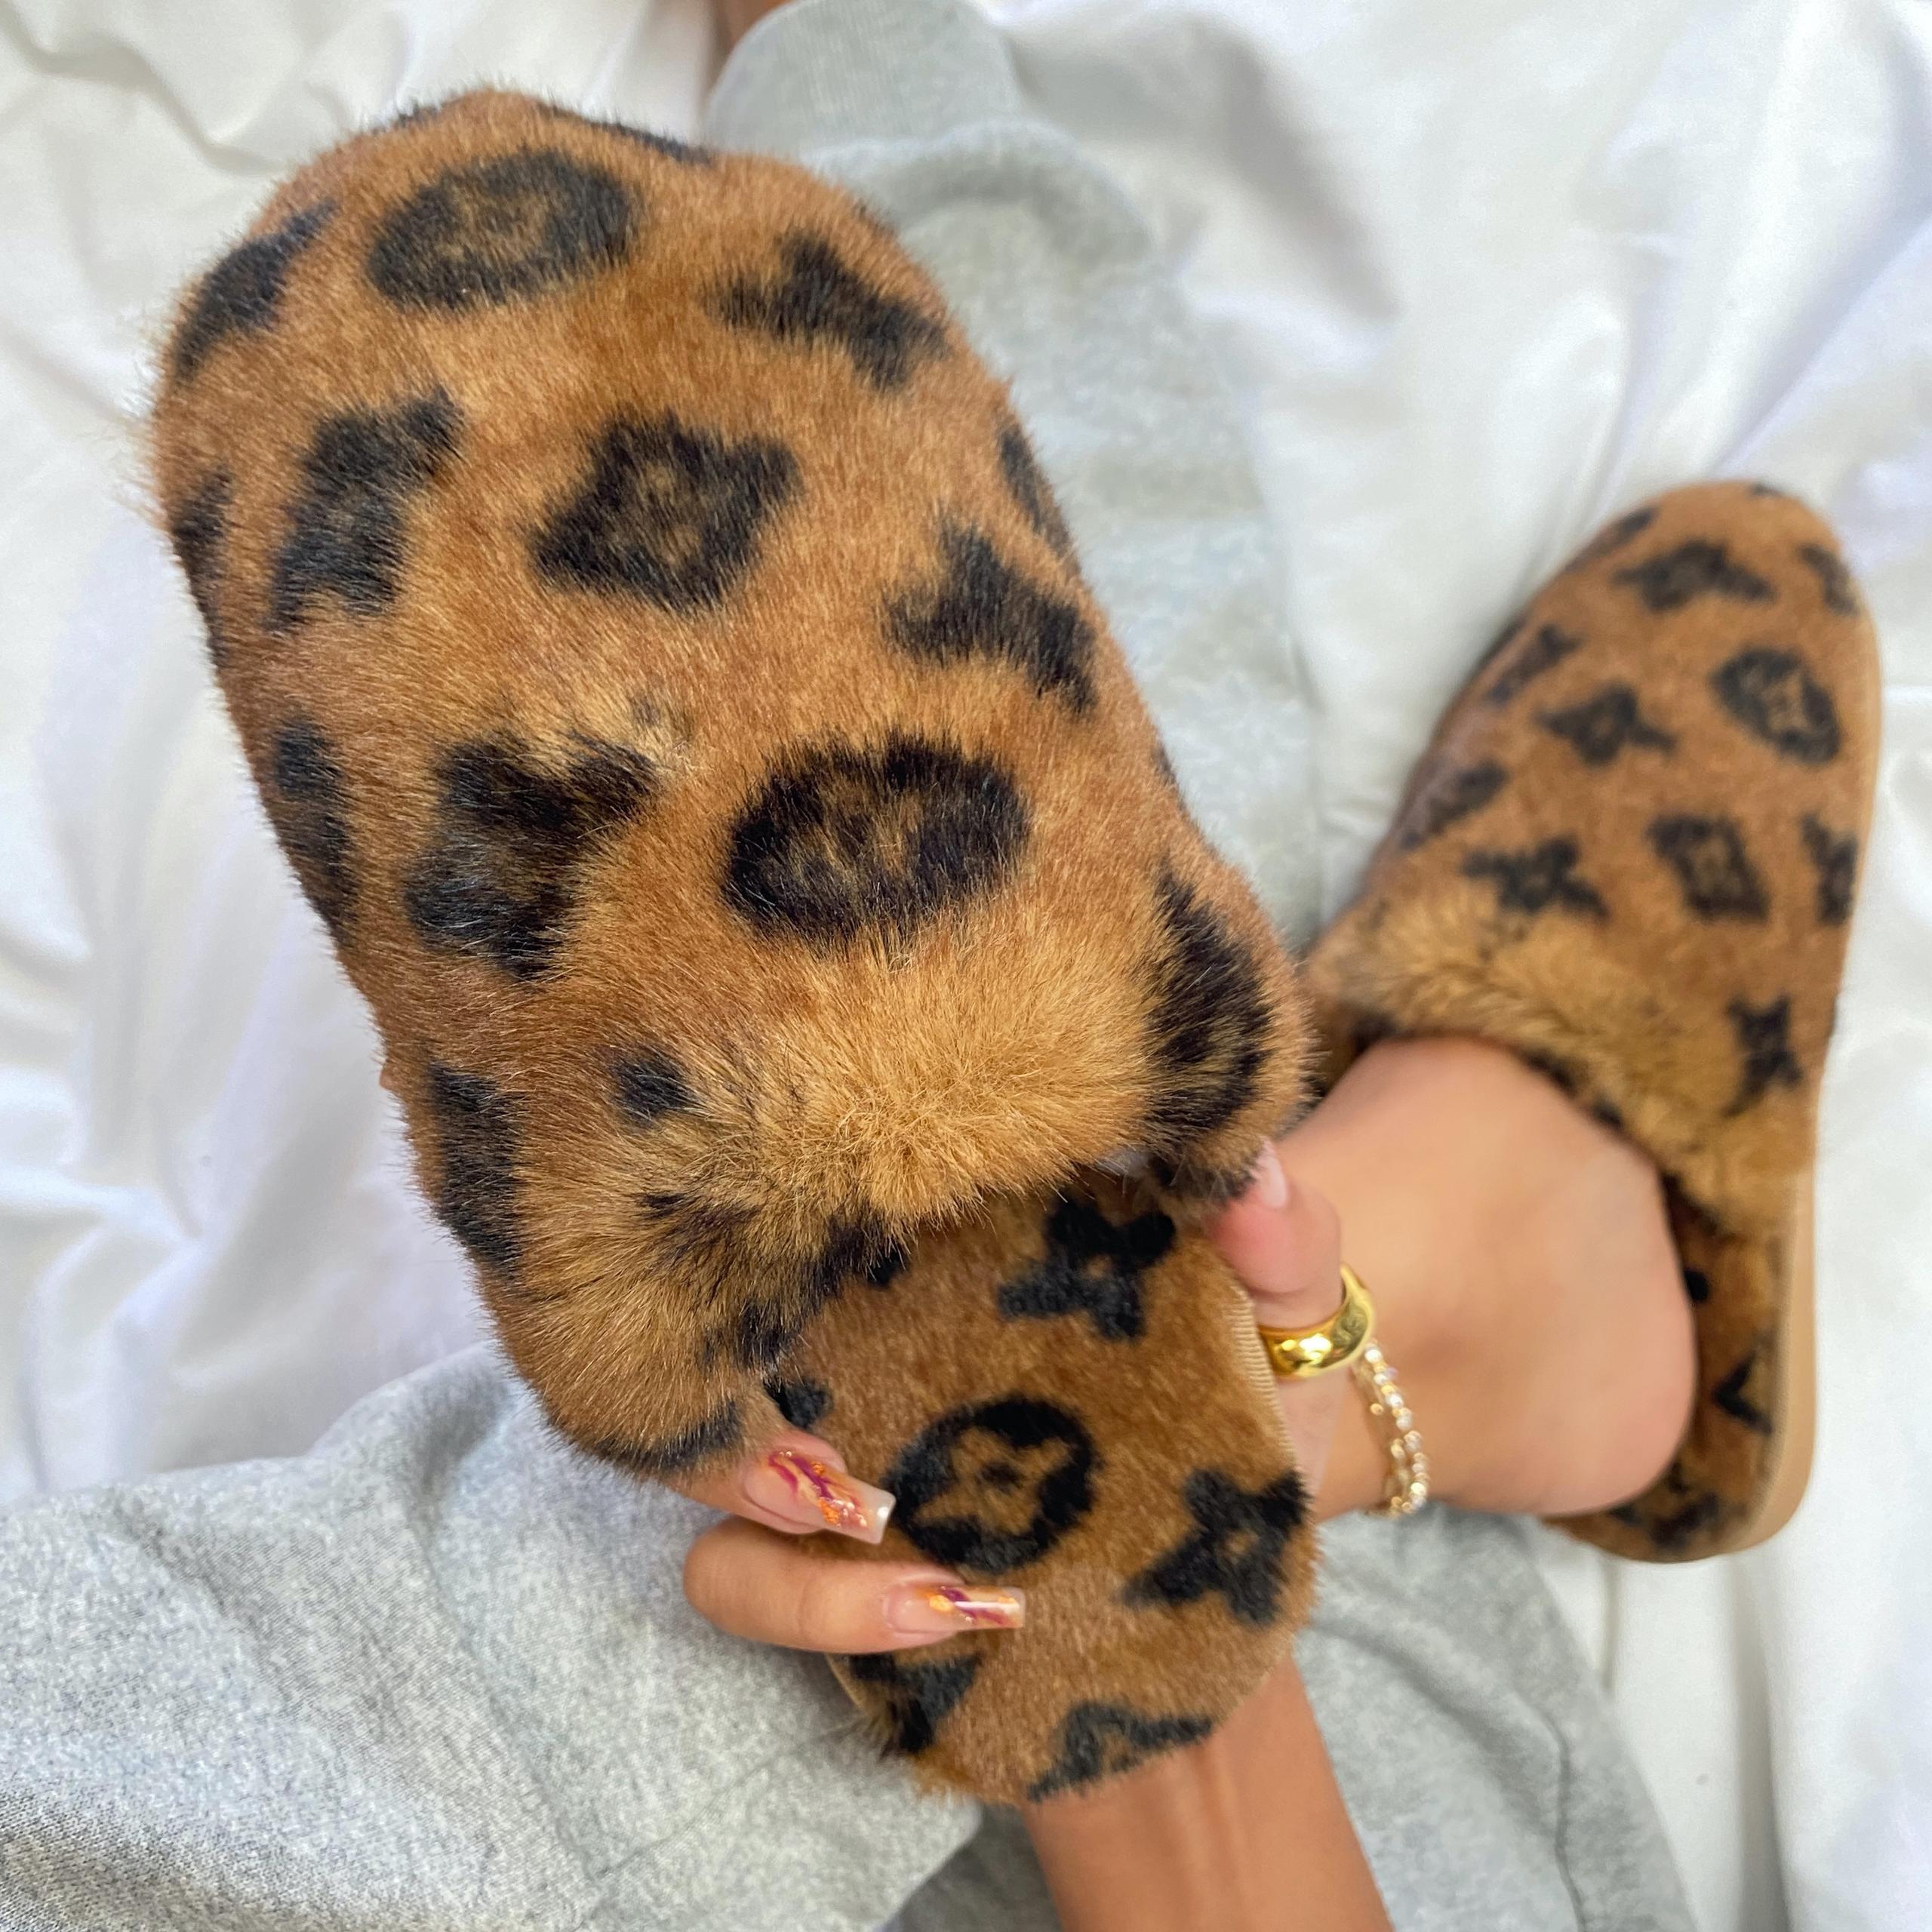 EGO Kulture Fluffy Printed Detail Flat Slipper In Tan Brown Faux Fur, Brown  - female - Size: 7